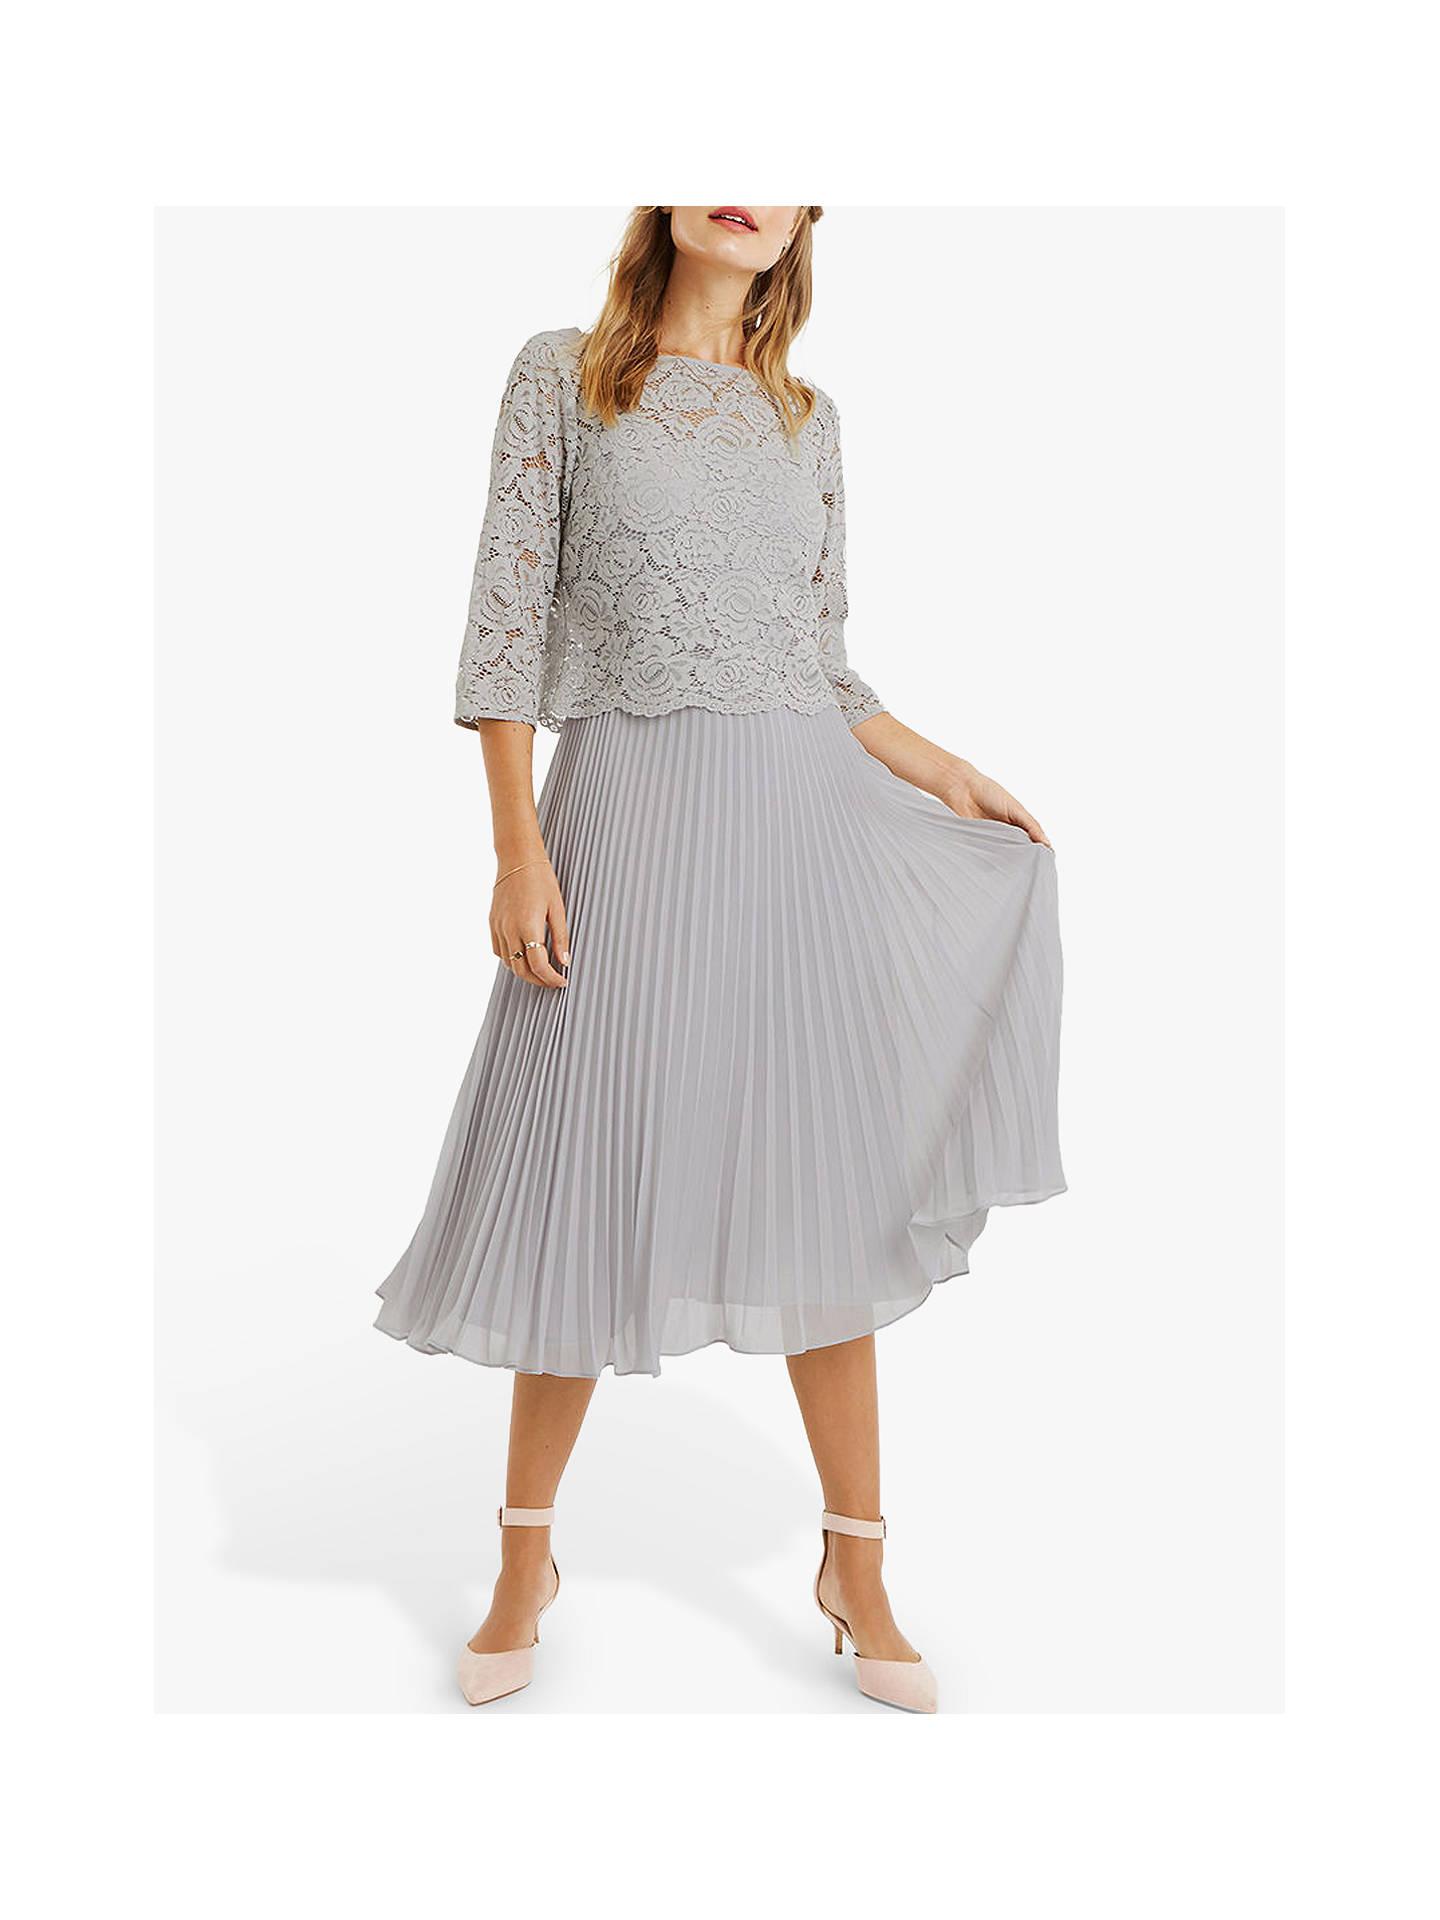 66db40d62c26 Buy Oasis Lace Top Midi Dress, Pale Grey, 12L Online at johnlewis.com ...